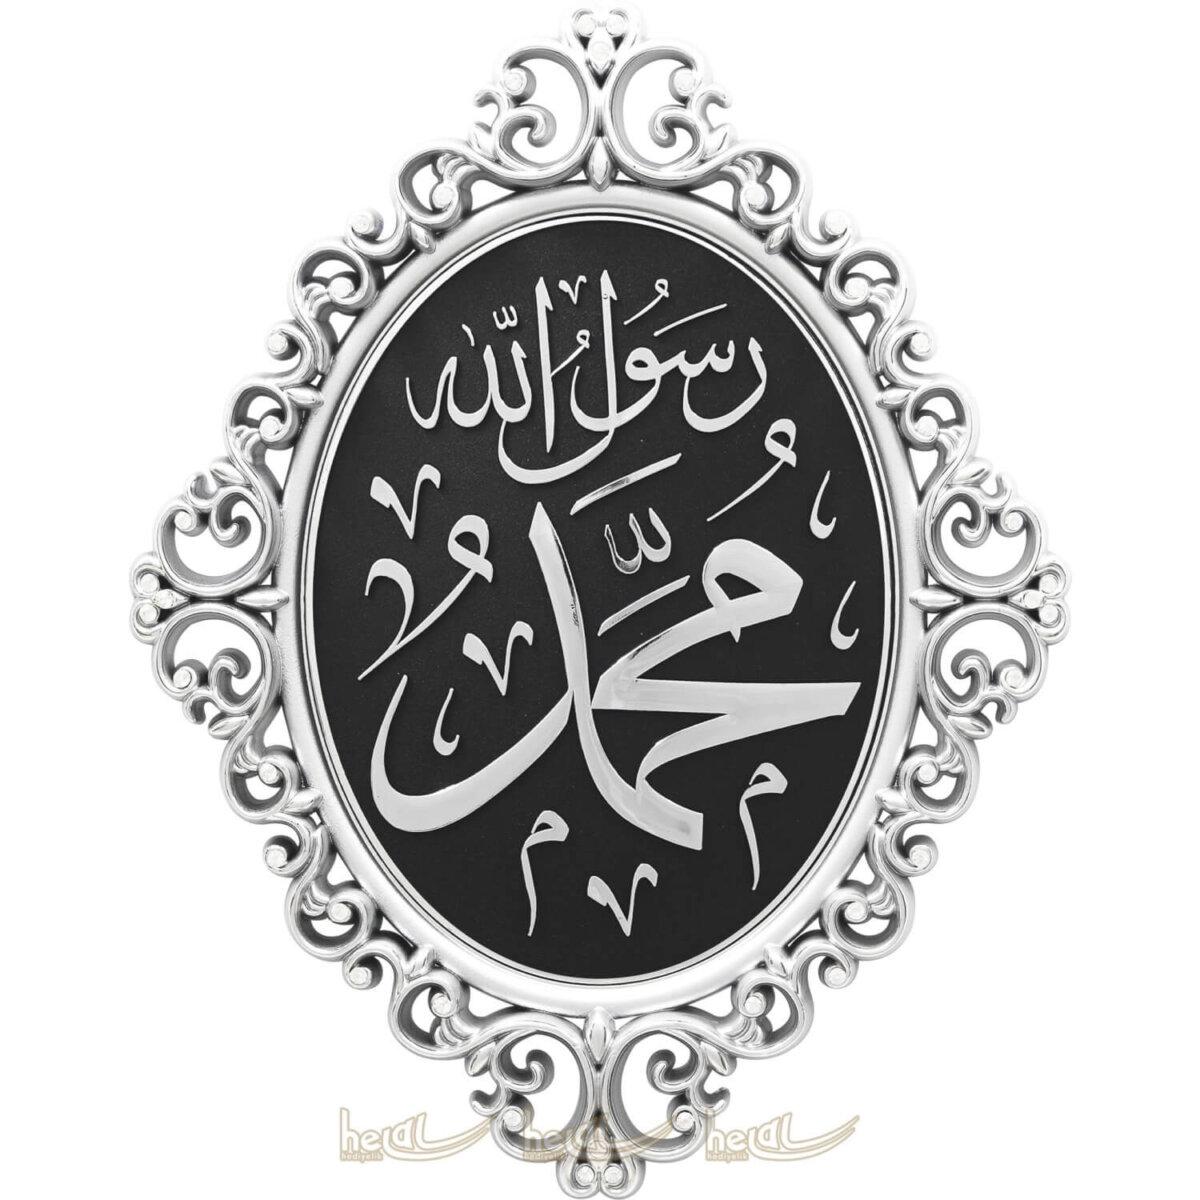 24x31cm İsmi Nebi Muhammed sav.Lafzı Taşlı Osmanlı Motifli Modern Lüks Duvar Panosu 24x31cm İsmi Nebi Muhammed sav.Lafzı Taşlı Osmanlı Motifli Modern Lüks Duvar Panosu